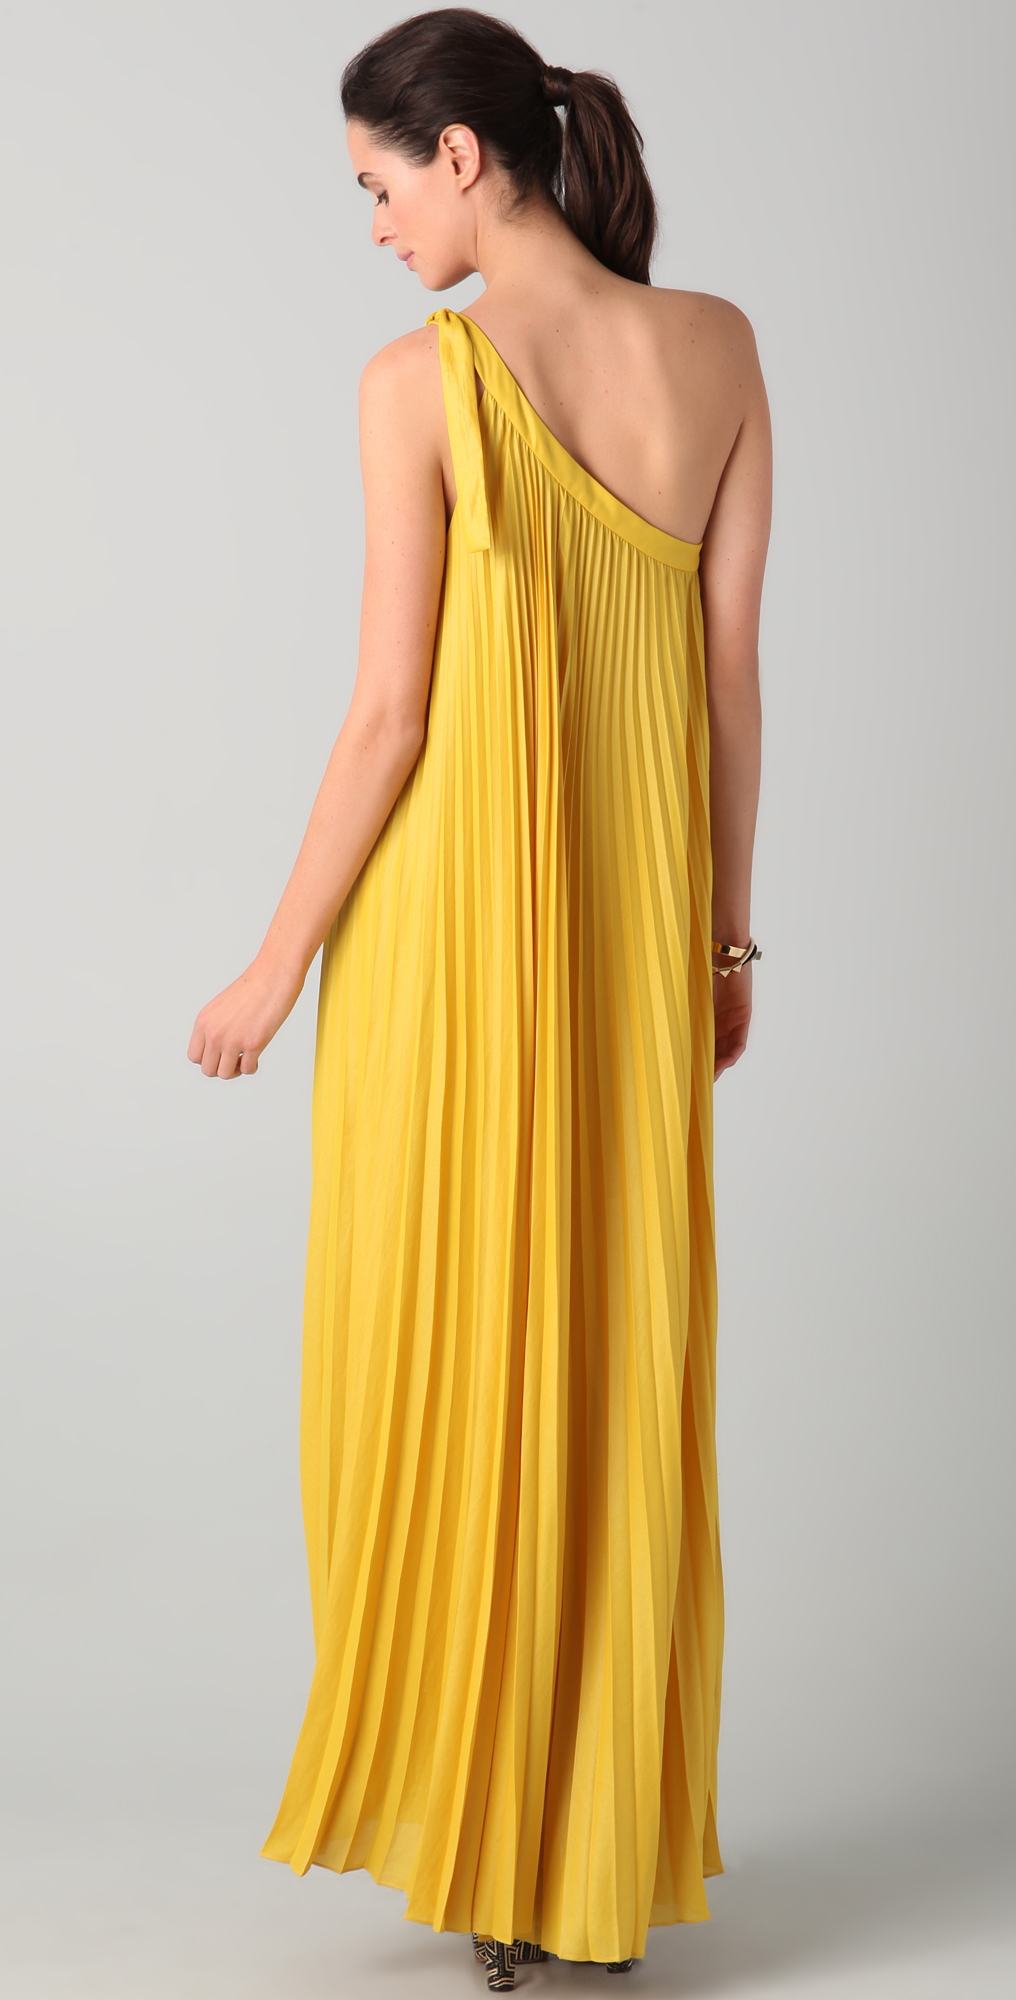 adfd4cca94 BCBGMAXAZRIA Abee Maxi Dress